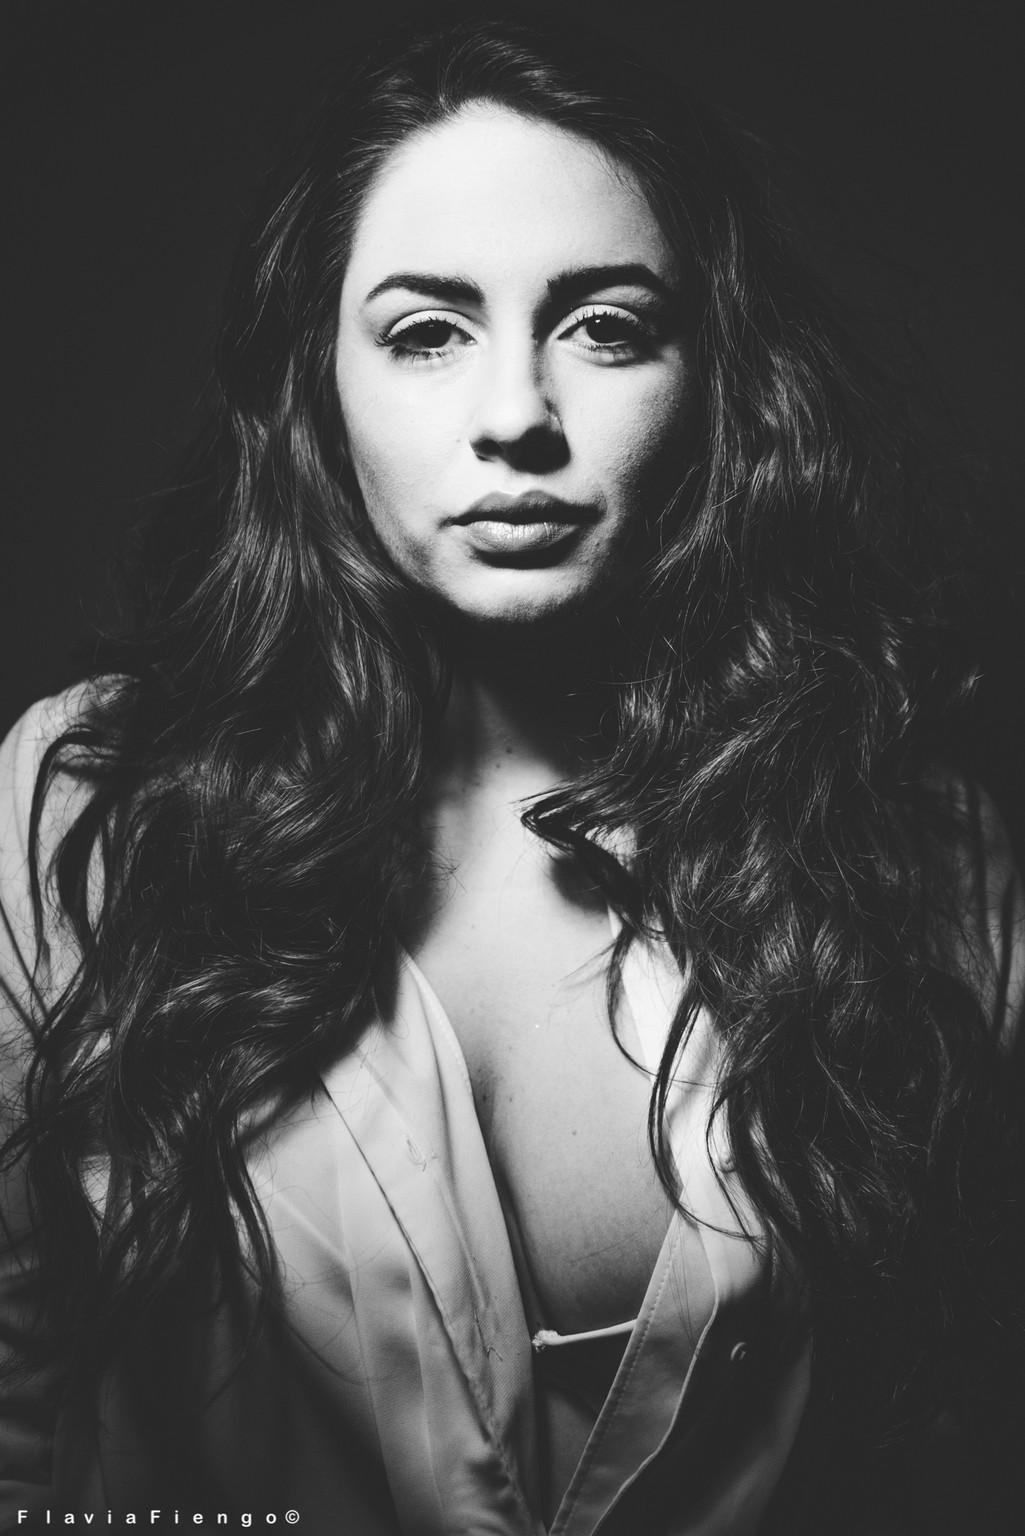 Flavia_Fiengo_portrait00009